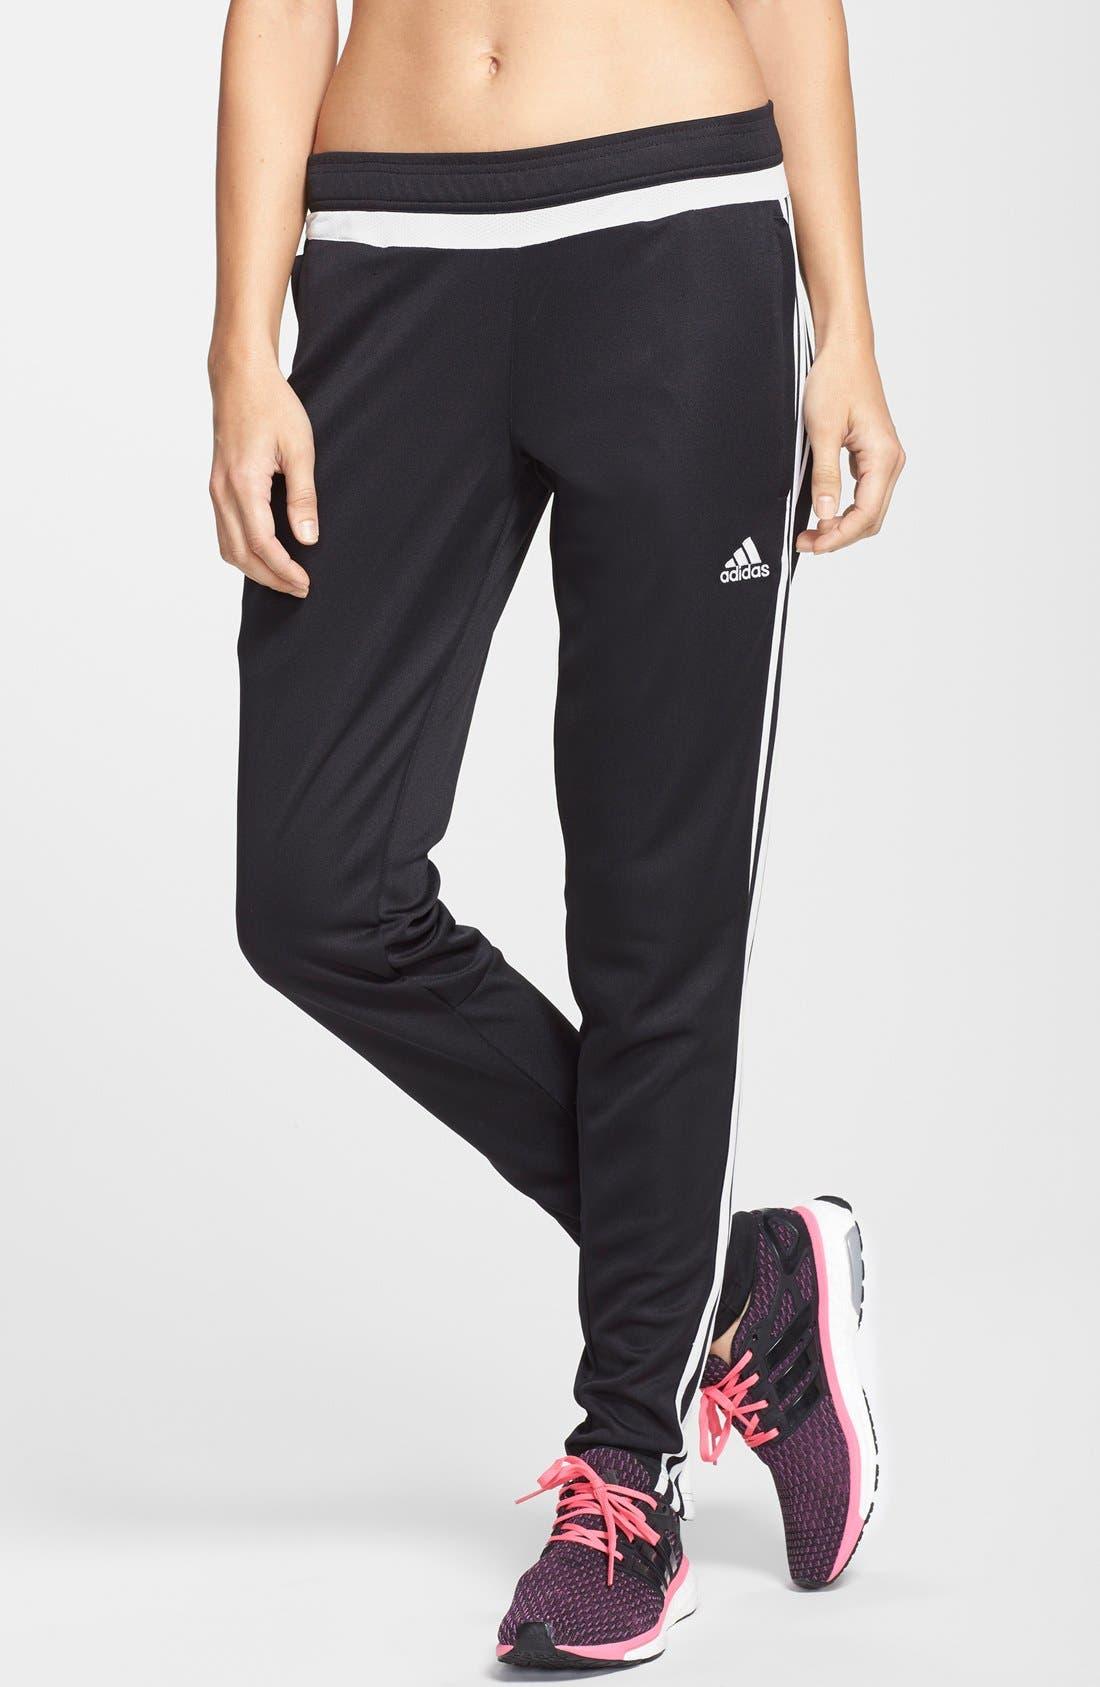 Main Image - adidas 'Tiro 15' Training Pants